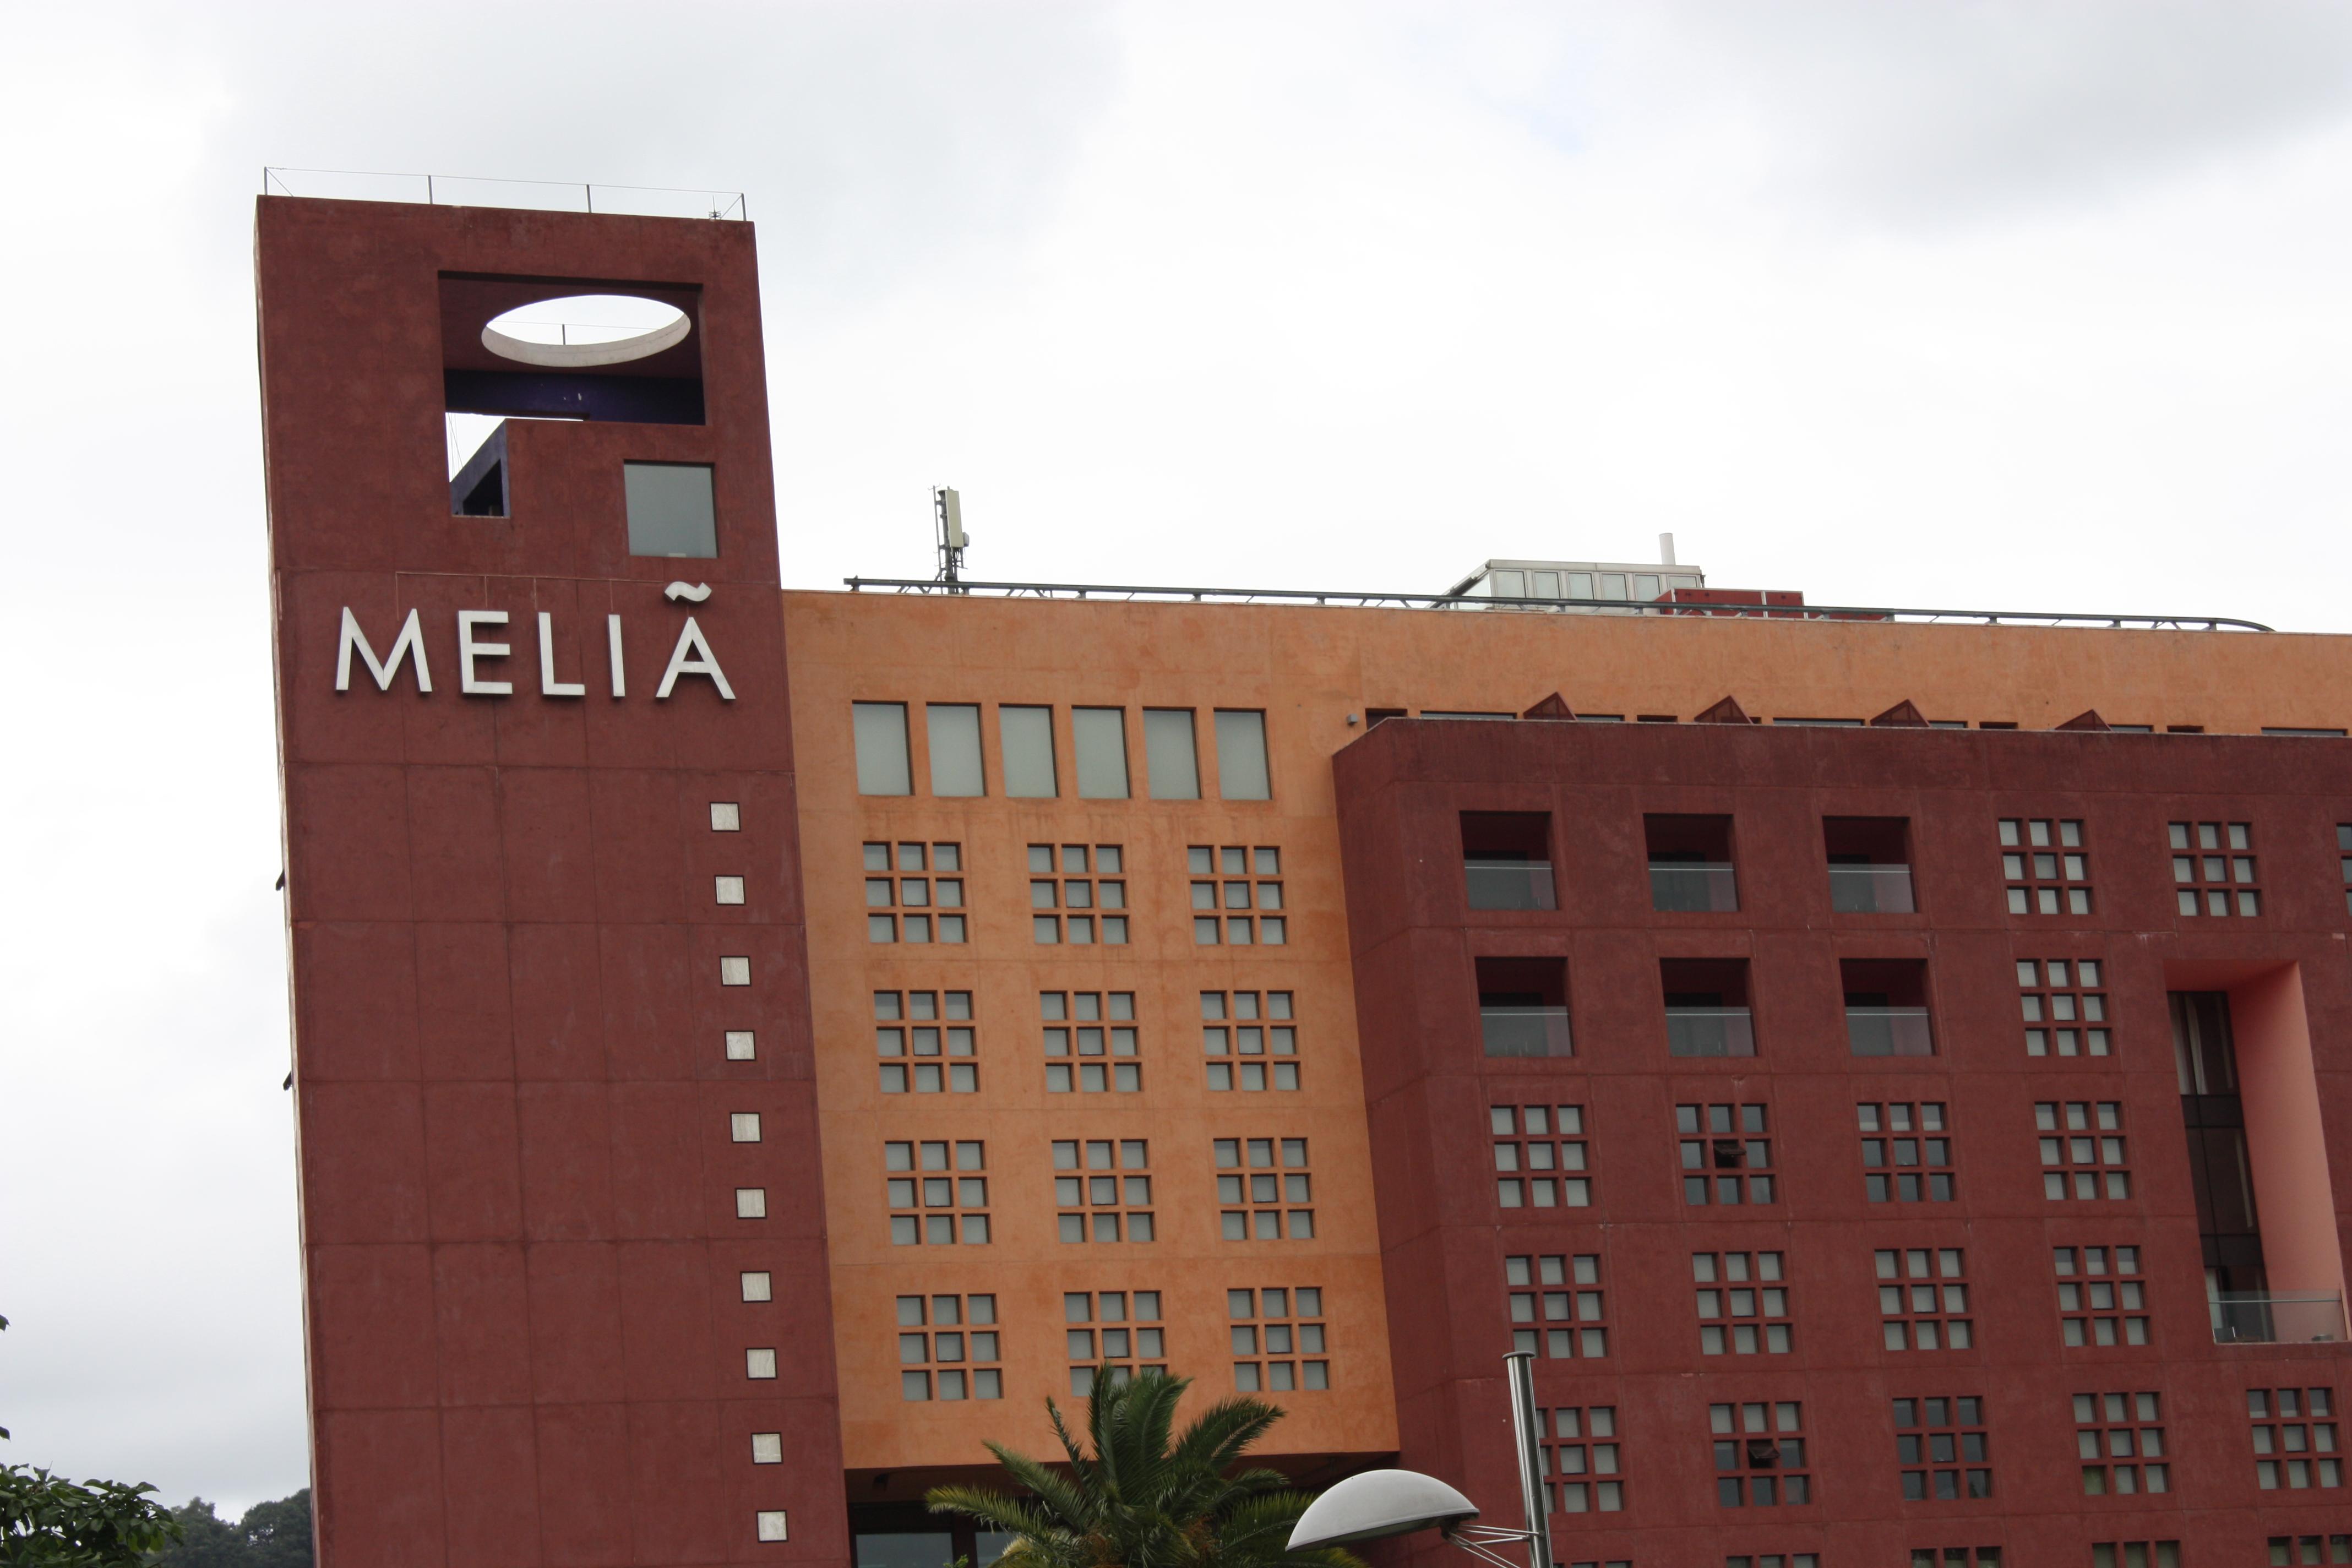 Hotel de la cadena Meliá en Bilbao / Wikimedia commons